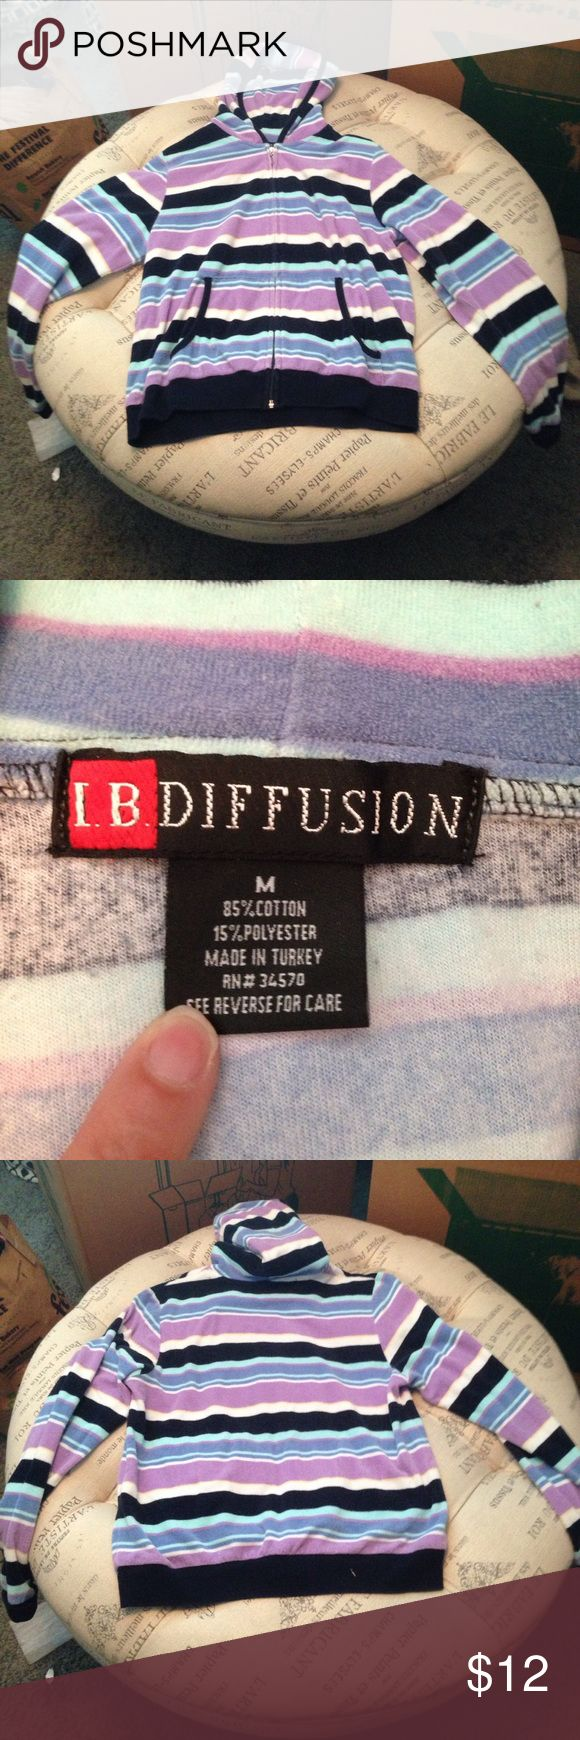 IB Diffusion purple striped zip up hoodie size M In good condition IB Diffusion purple stripe zip up hoodie size M SKU 209 I B Diffusion  Tops Sweatshirts & Hoodies